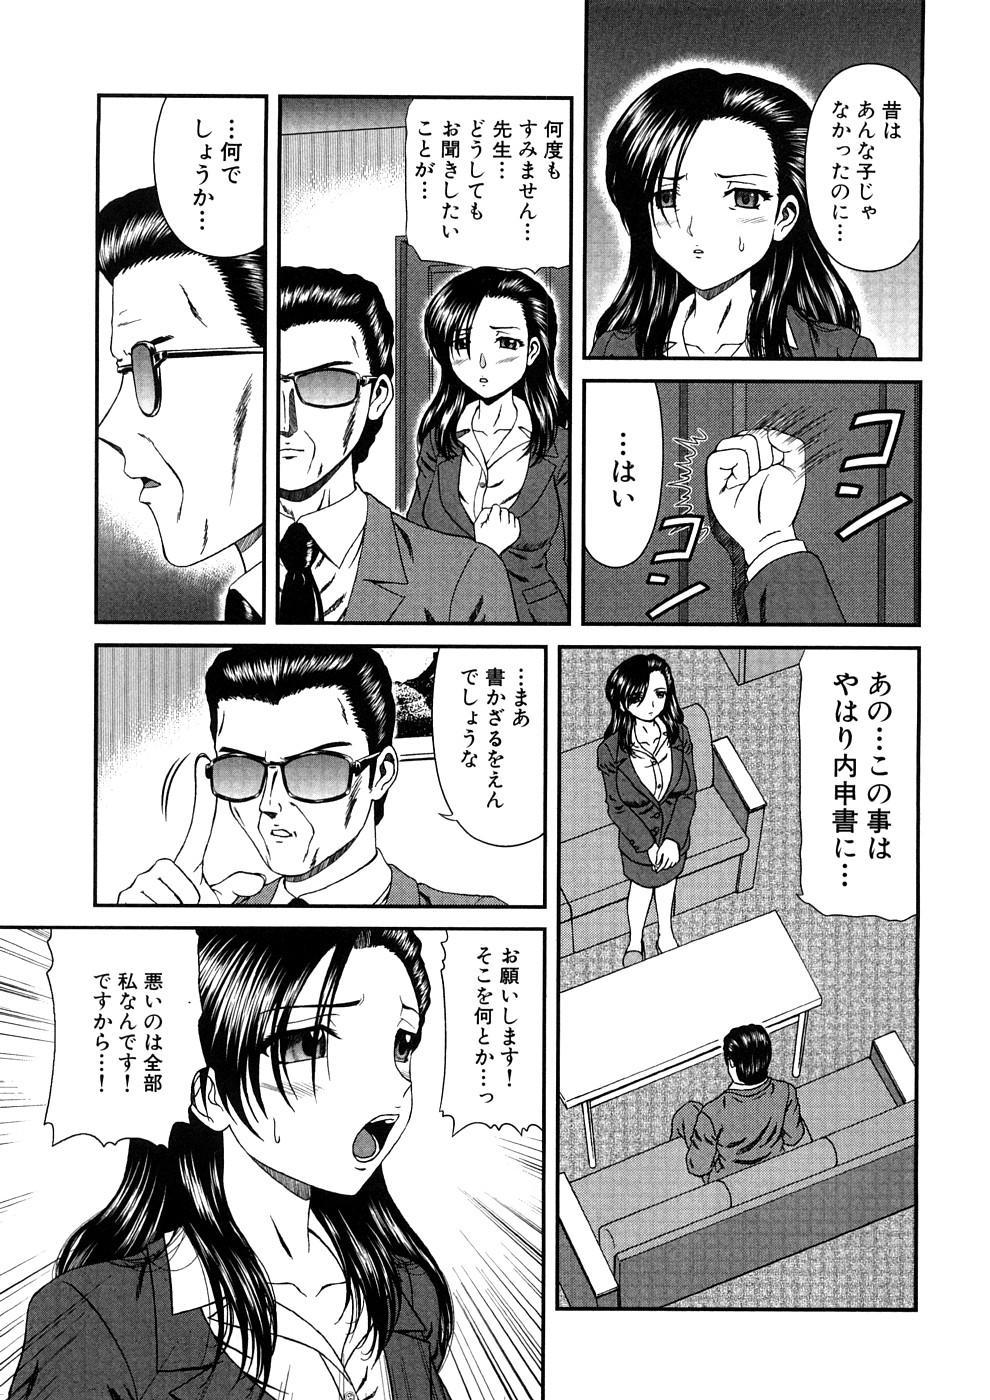 Geki Yaba Anthology Vol. 1 - Naka ni Dashite yo 141